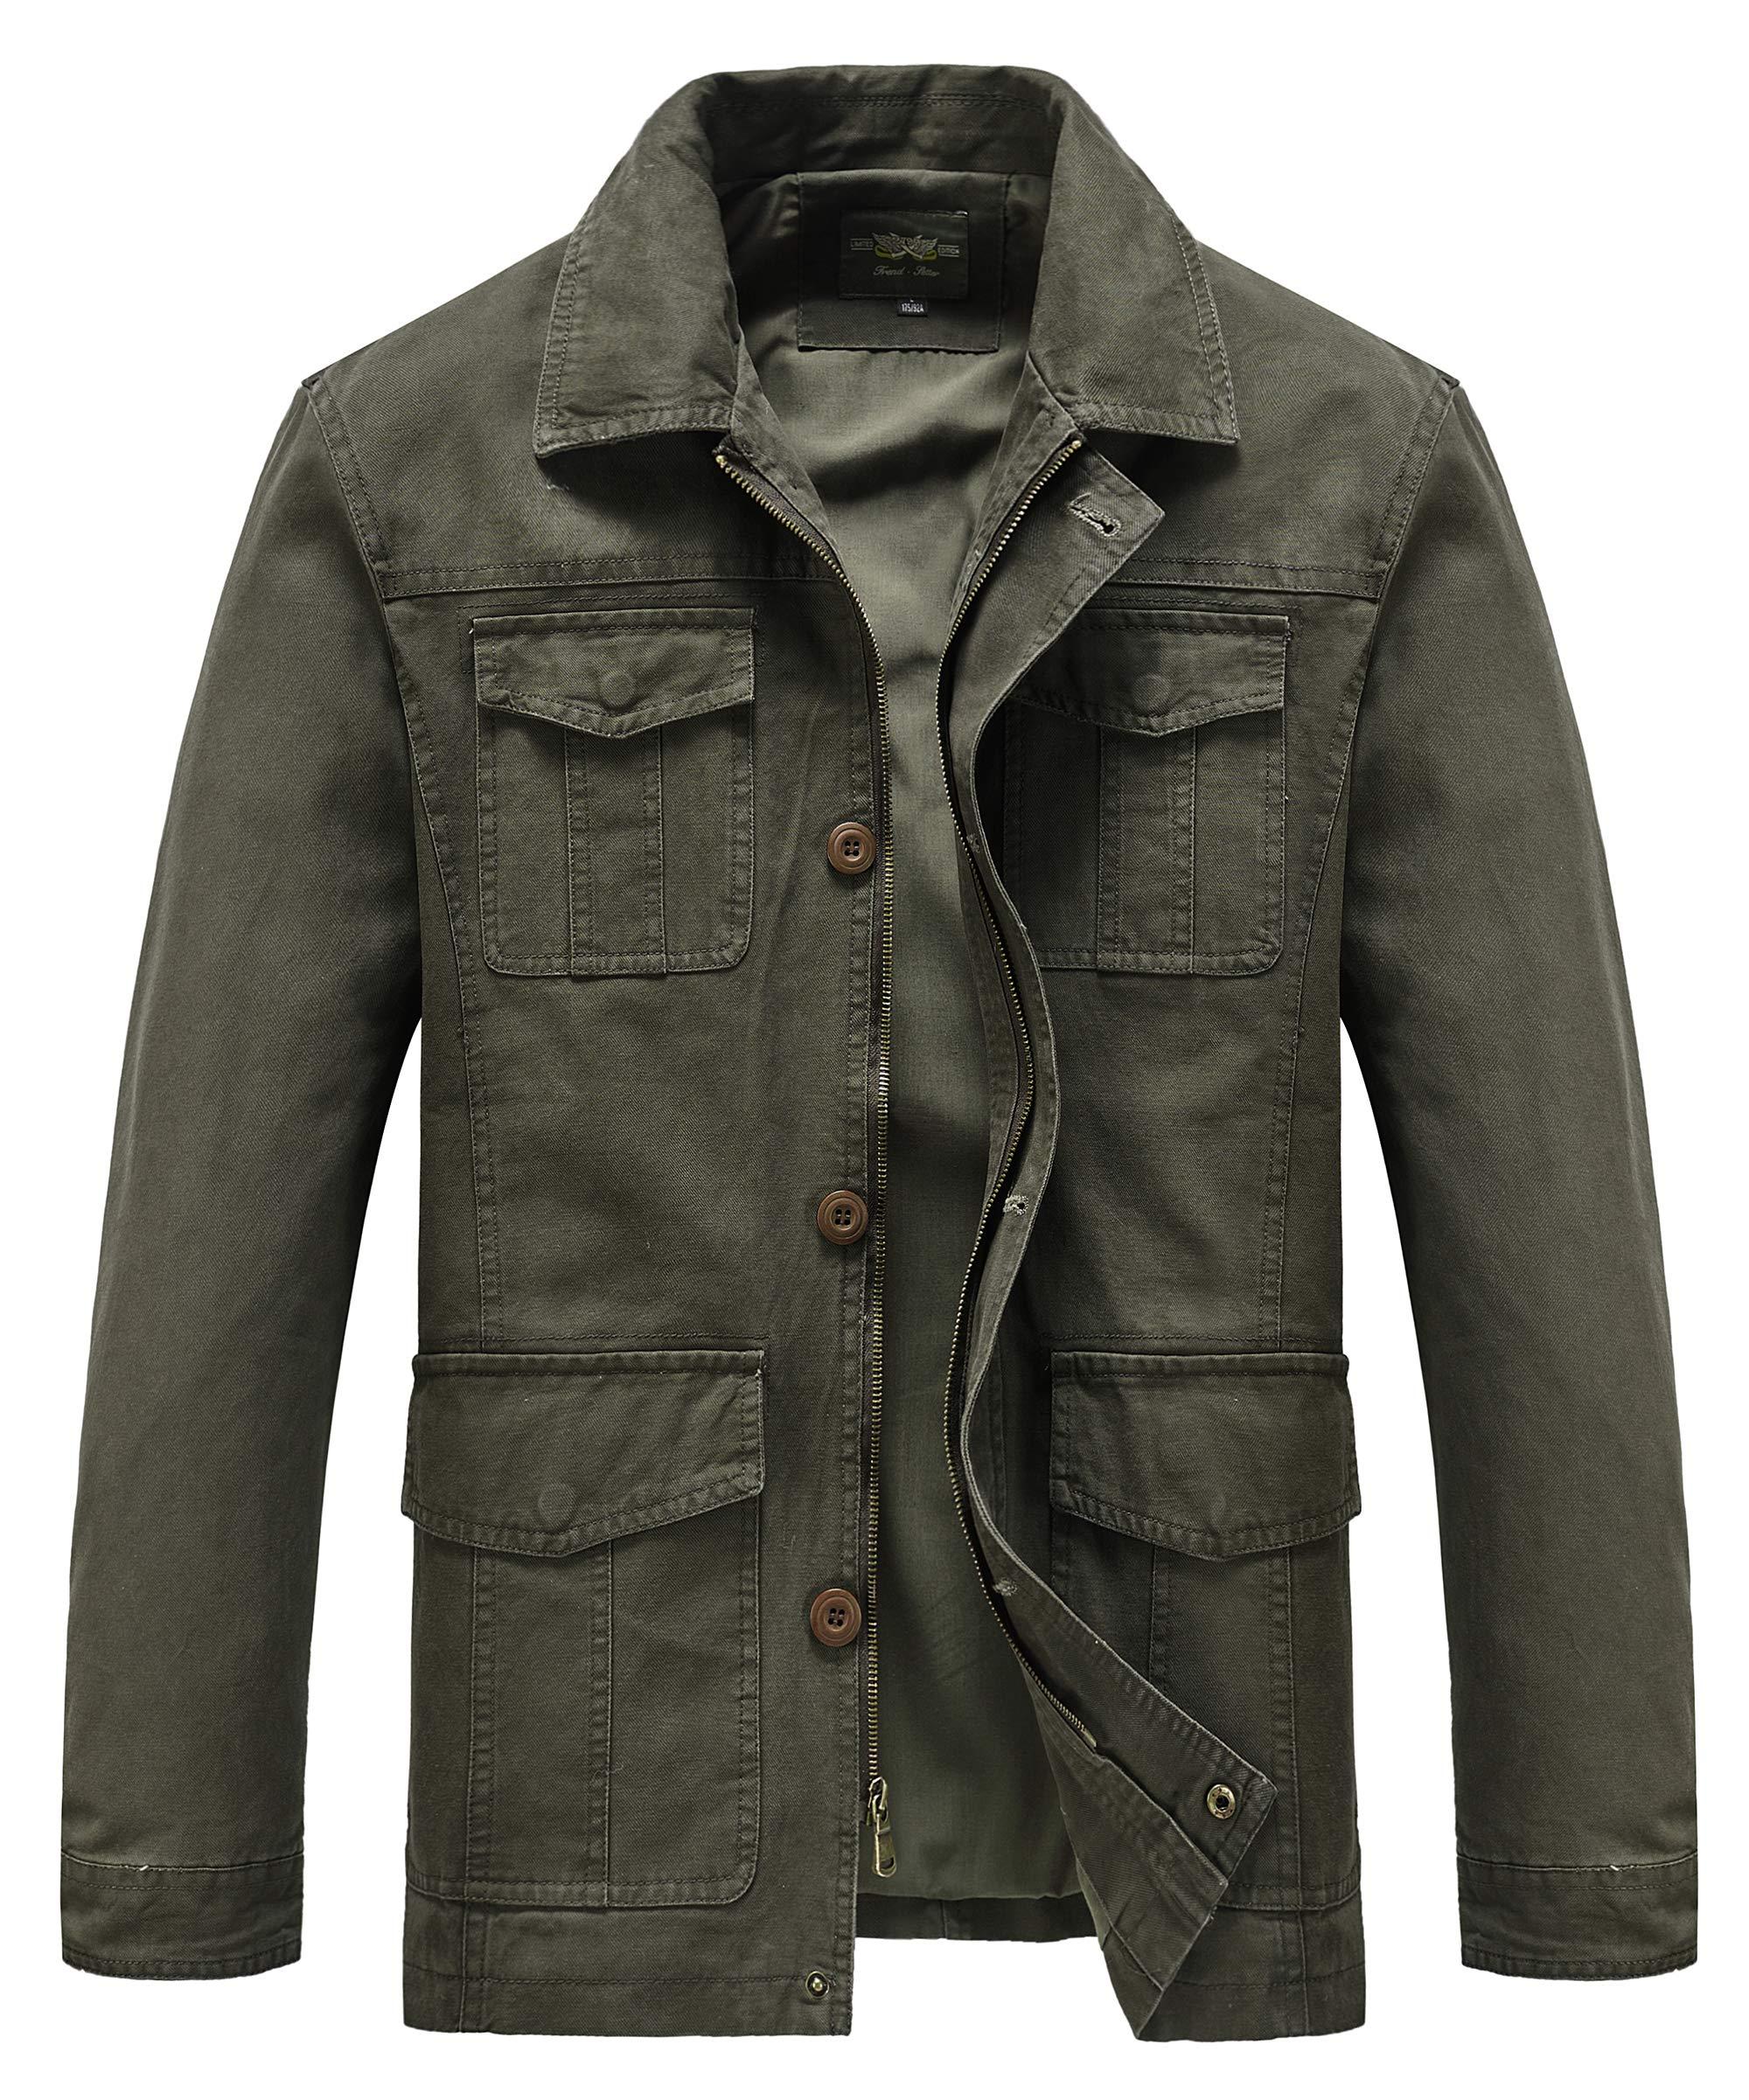 Heihuohua Men's Casual Flat Collar Cotton Jacket Military Lightweight Windbreaker, Army Green, US Medium/Tag Size XL by Heihuohua